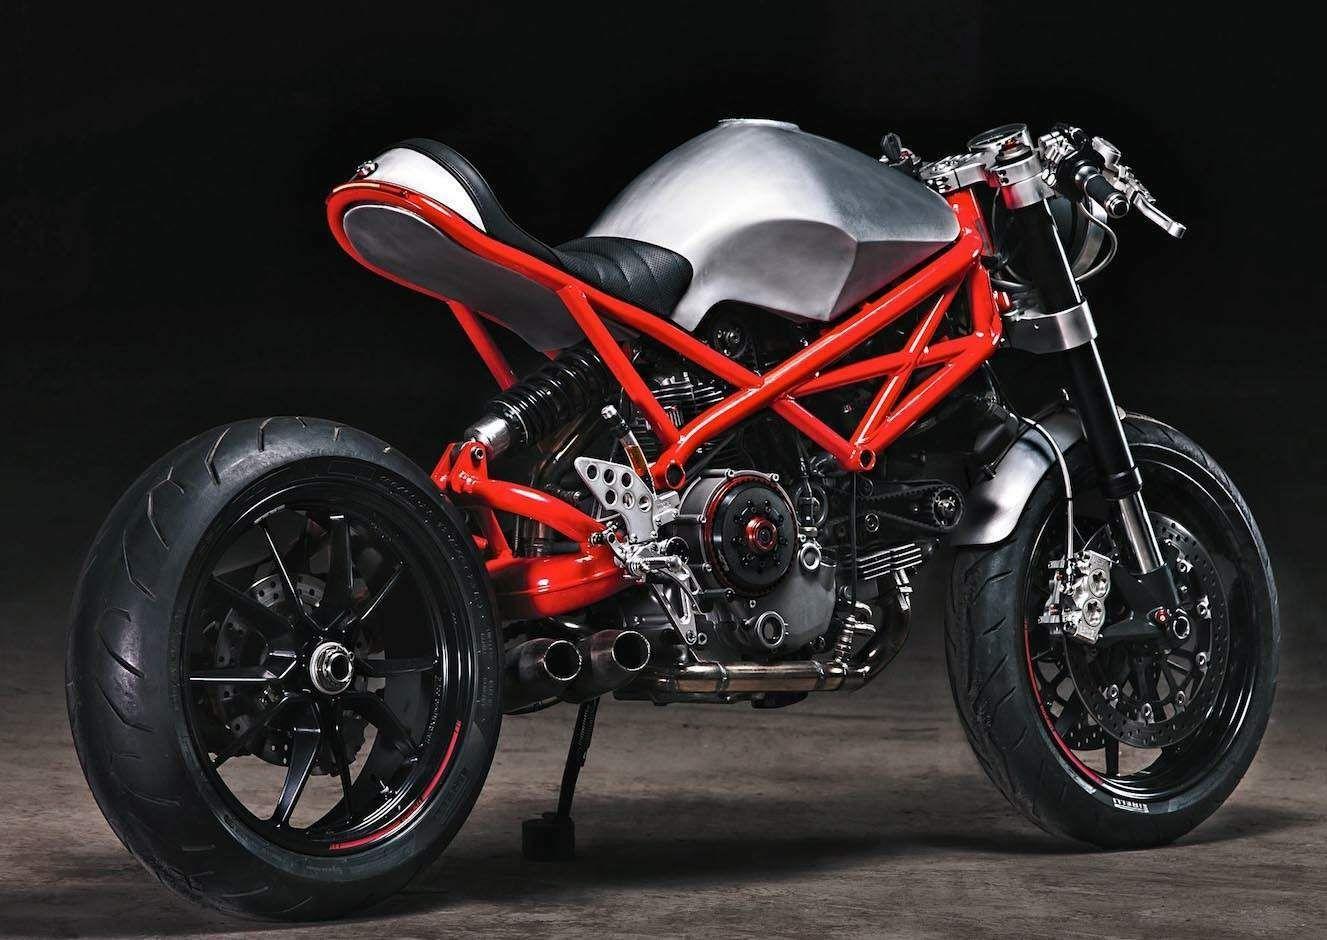 ducati monster 1100 evo special rat army motorbike. Black Bedroom Furniture Sets. Home Design Ideas